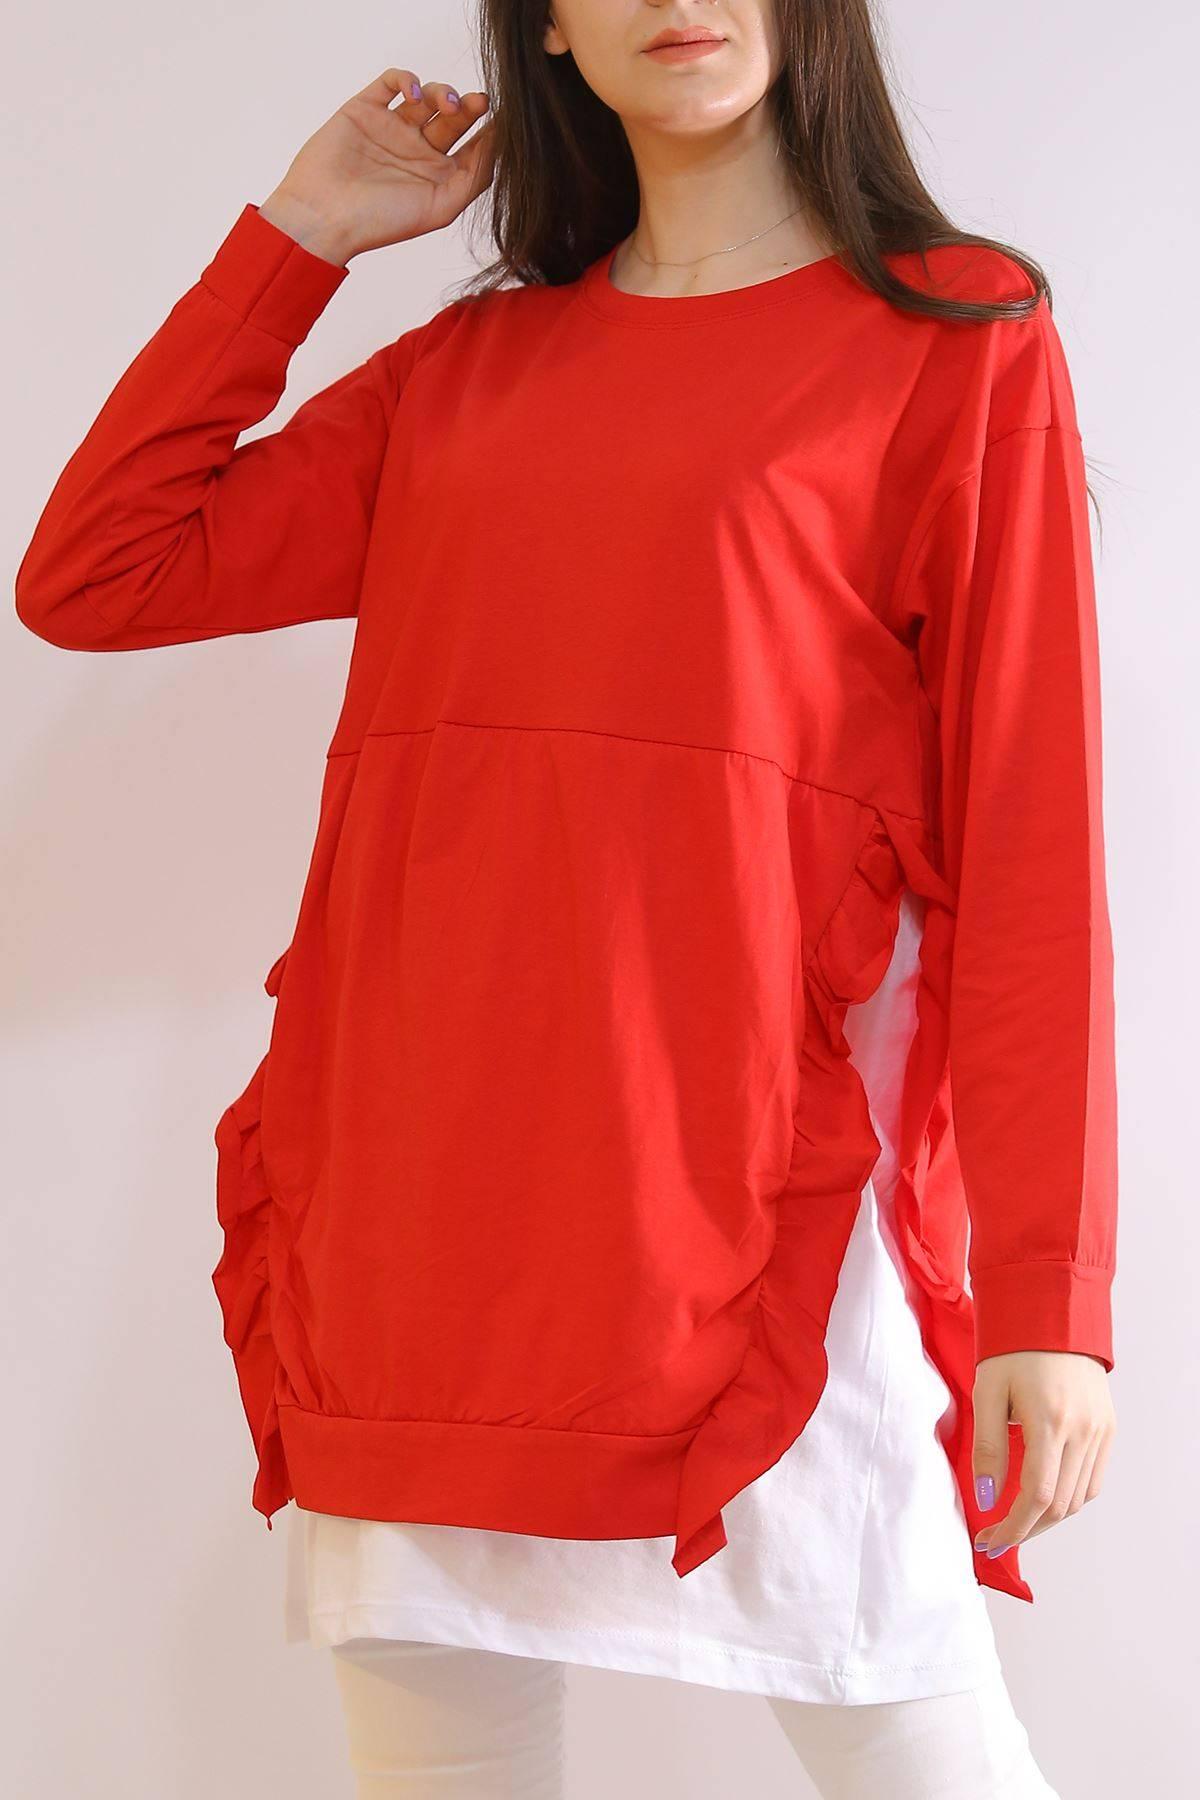 Fırfırlı Garnili Tunik Kırmızı - 3224.105.